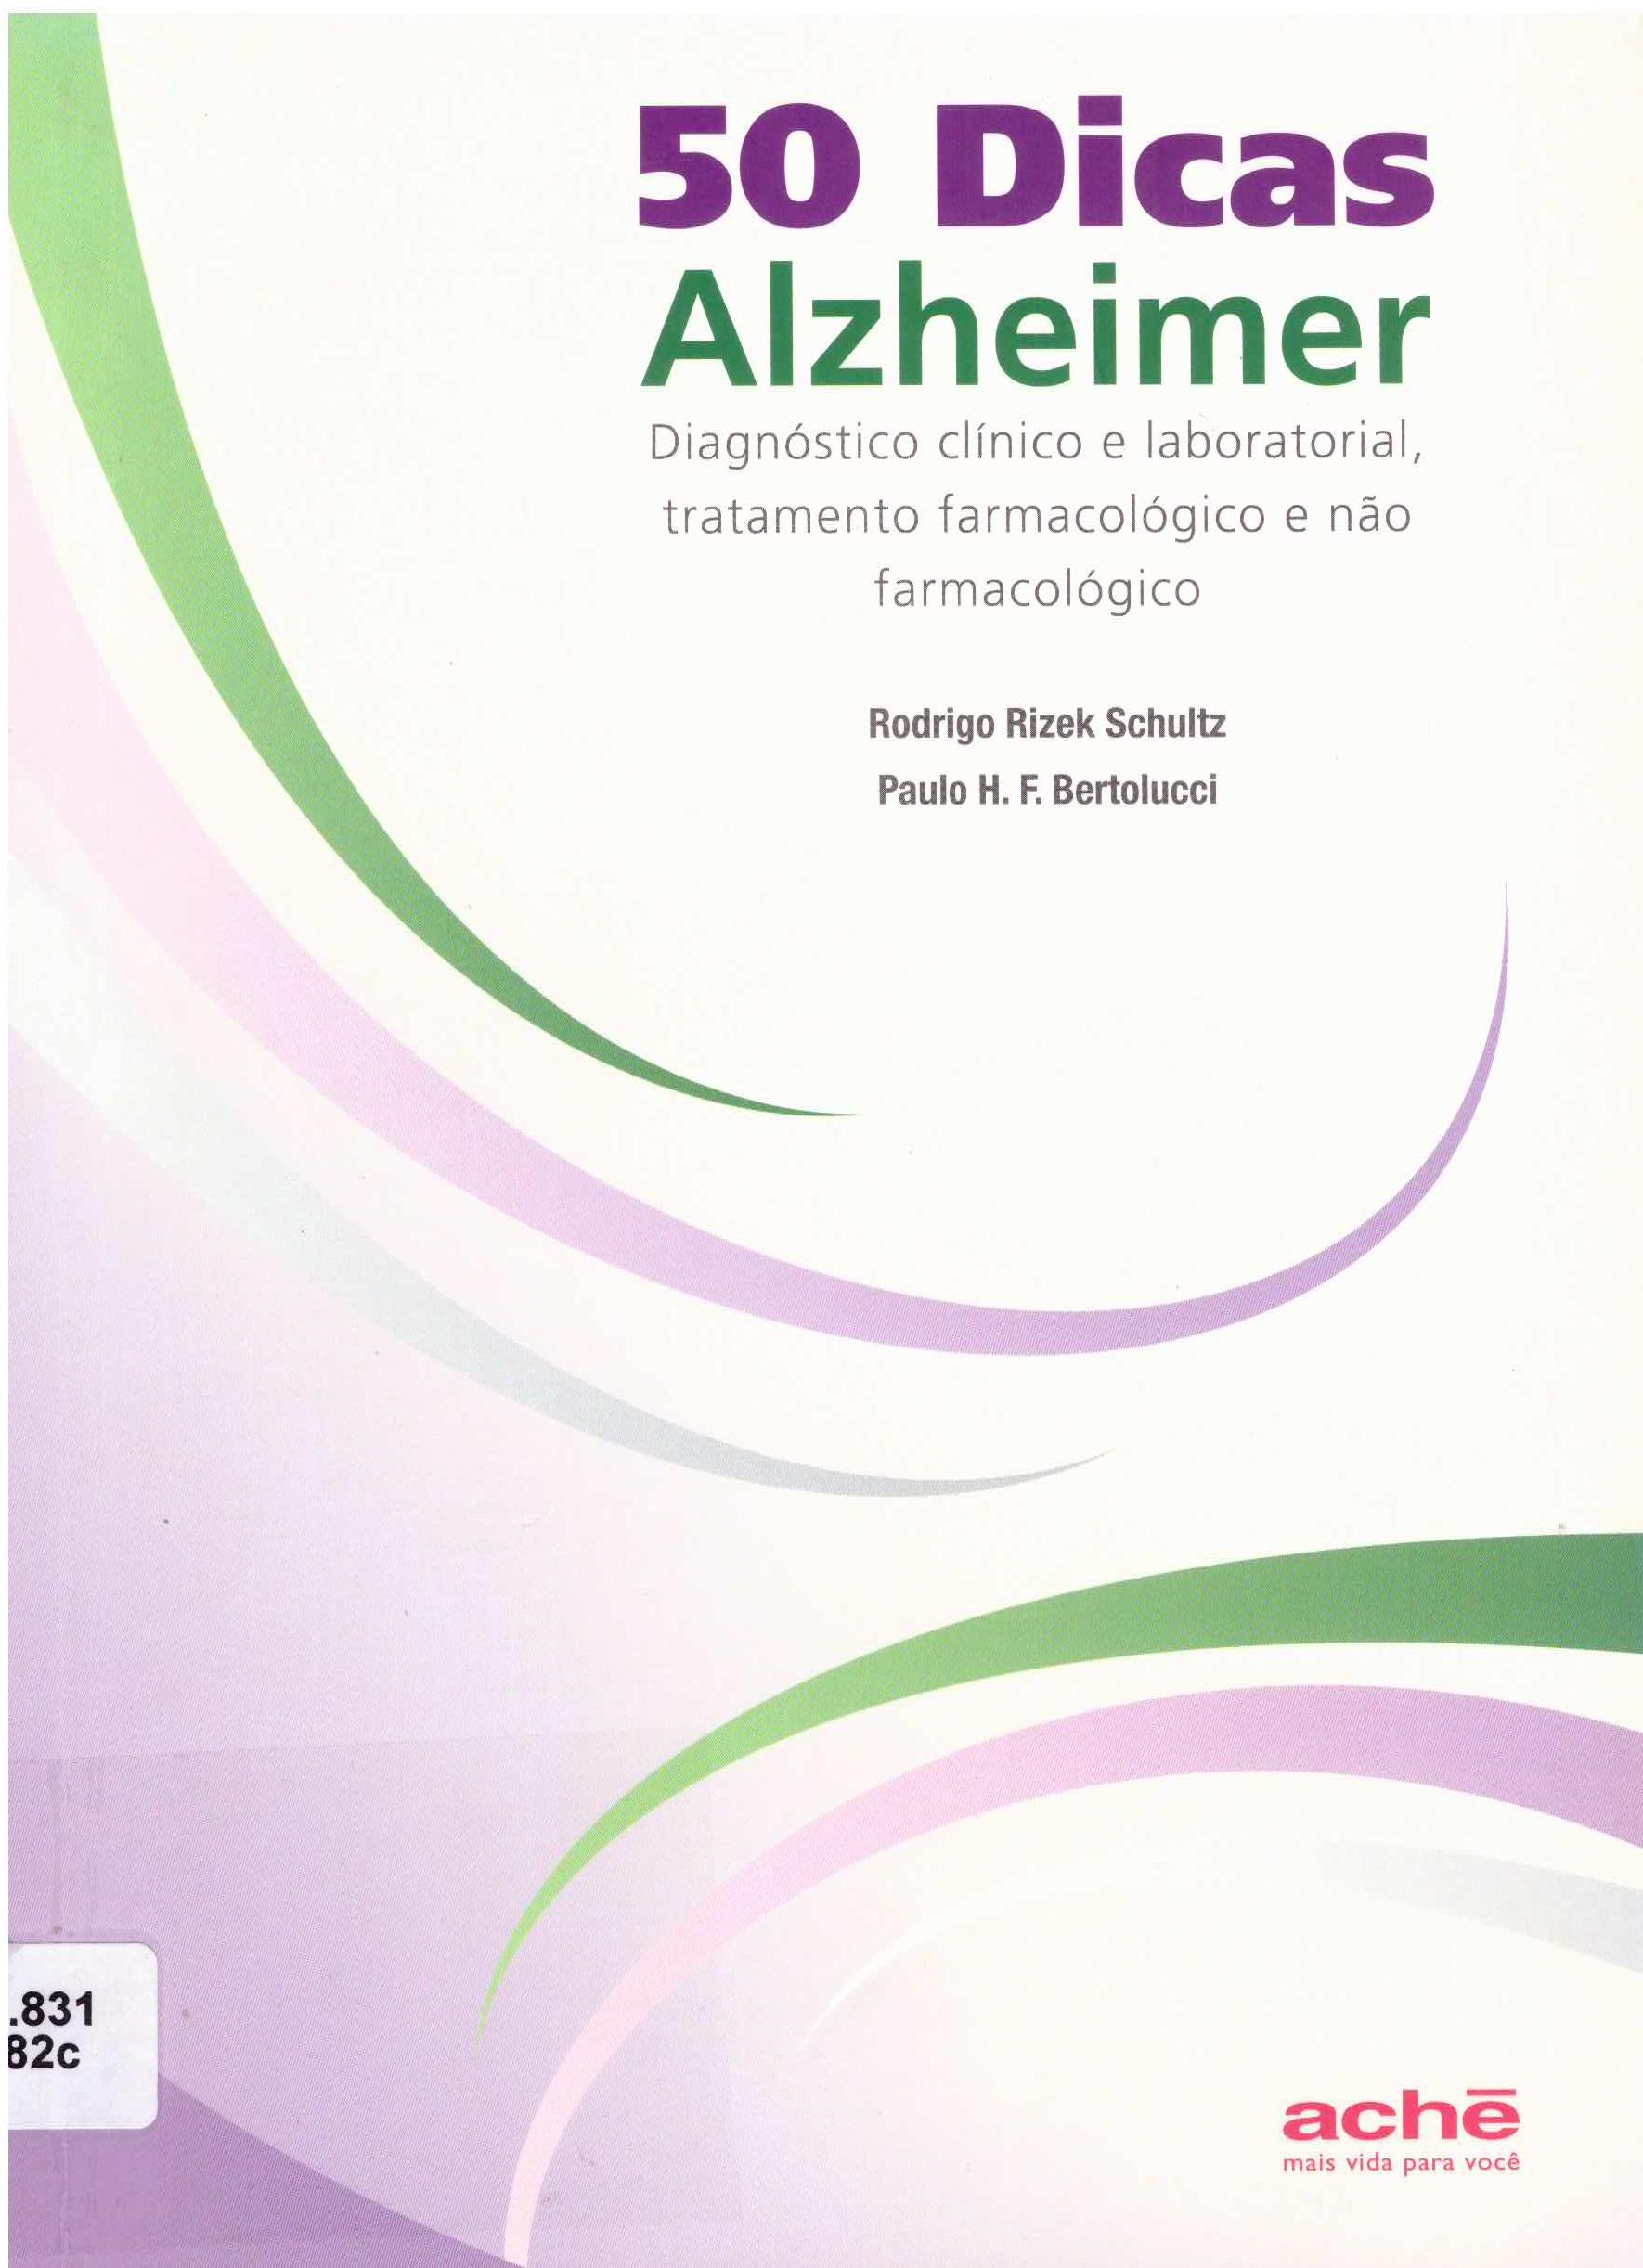 50 dicas de alzheimer